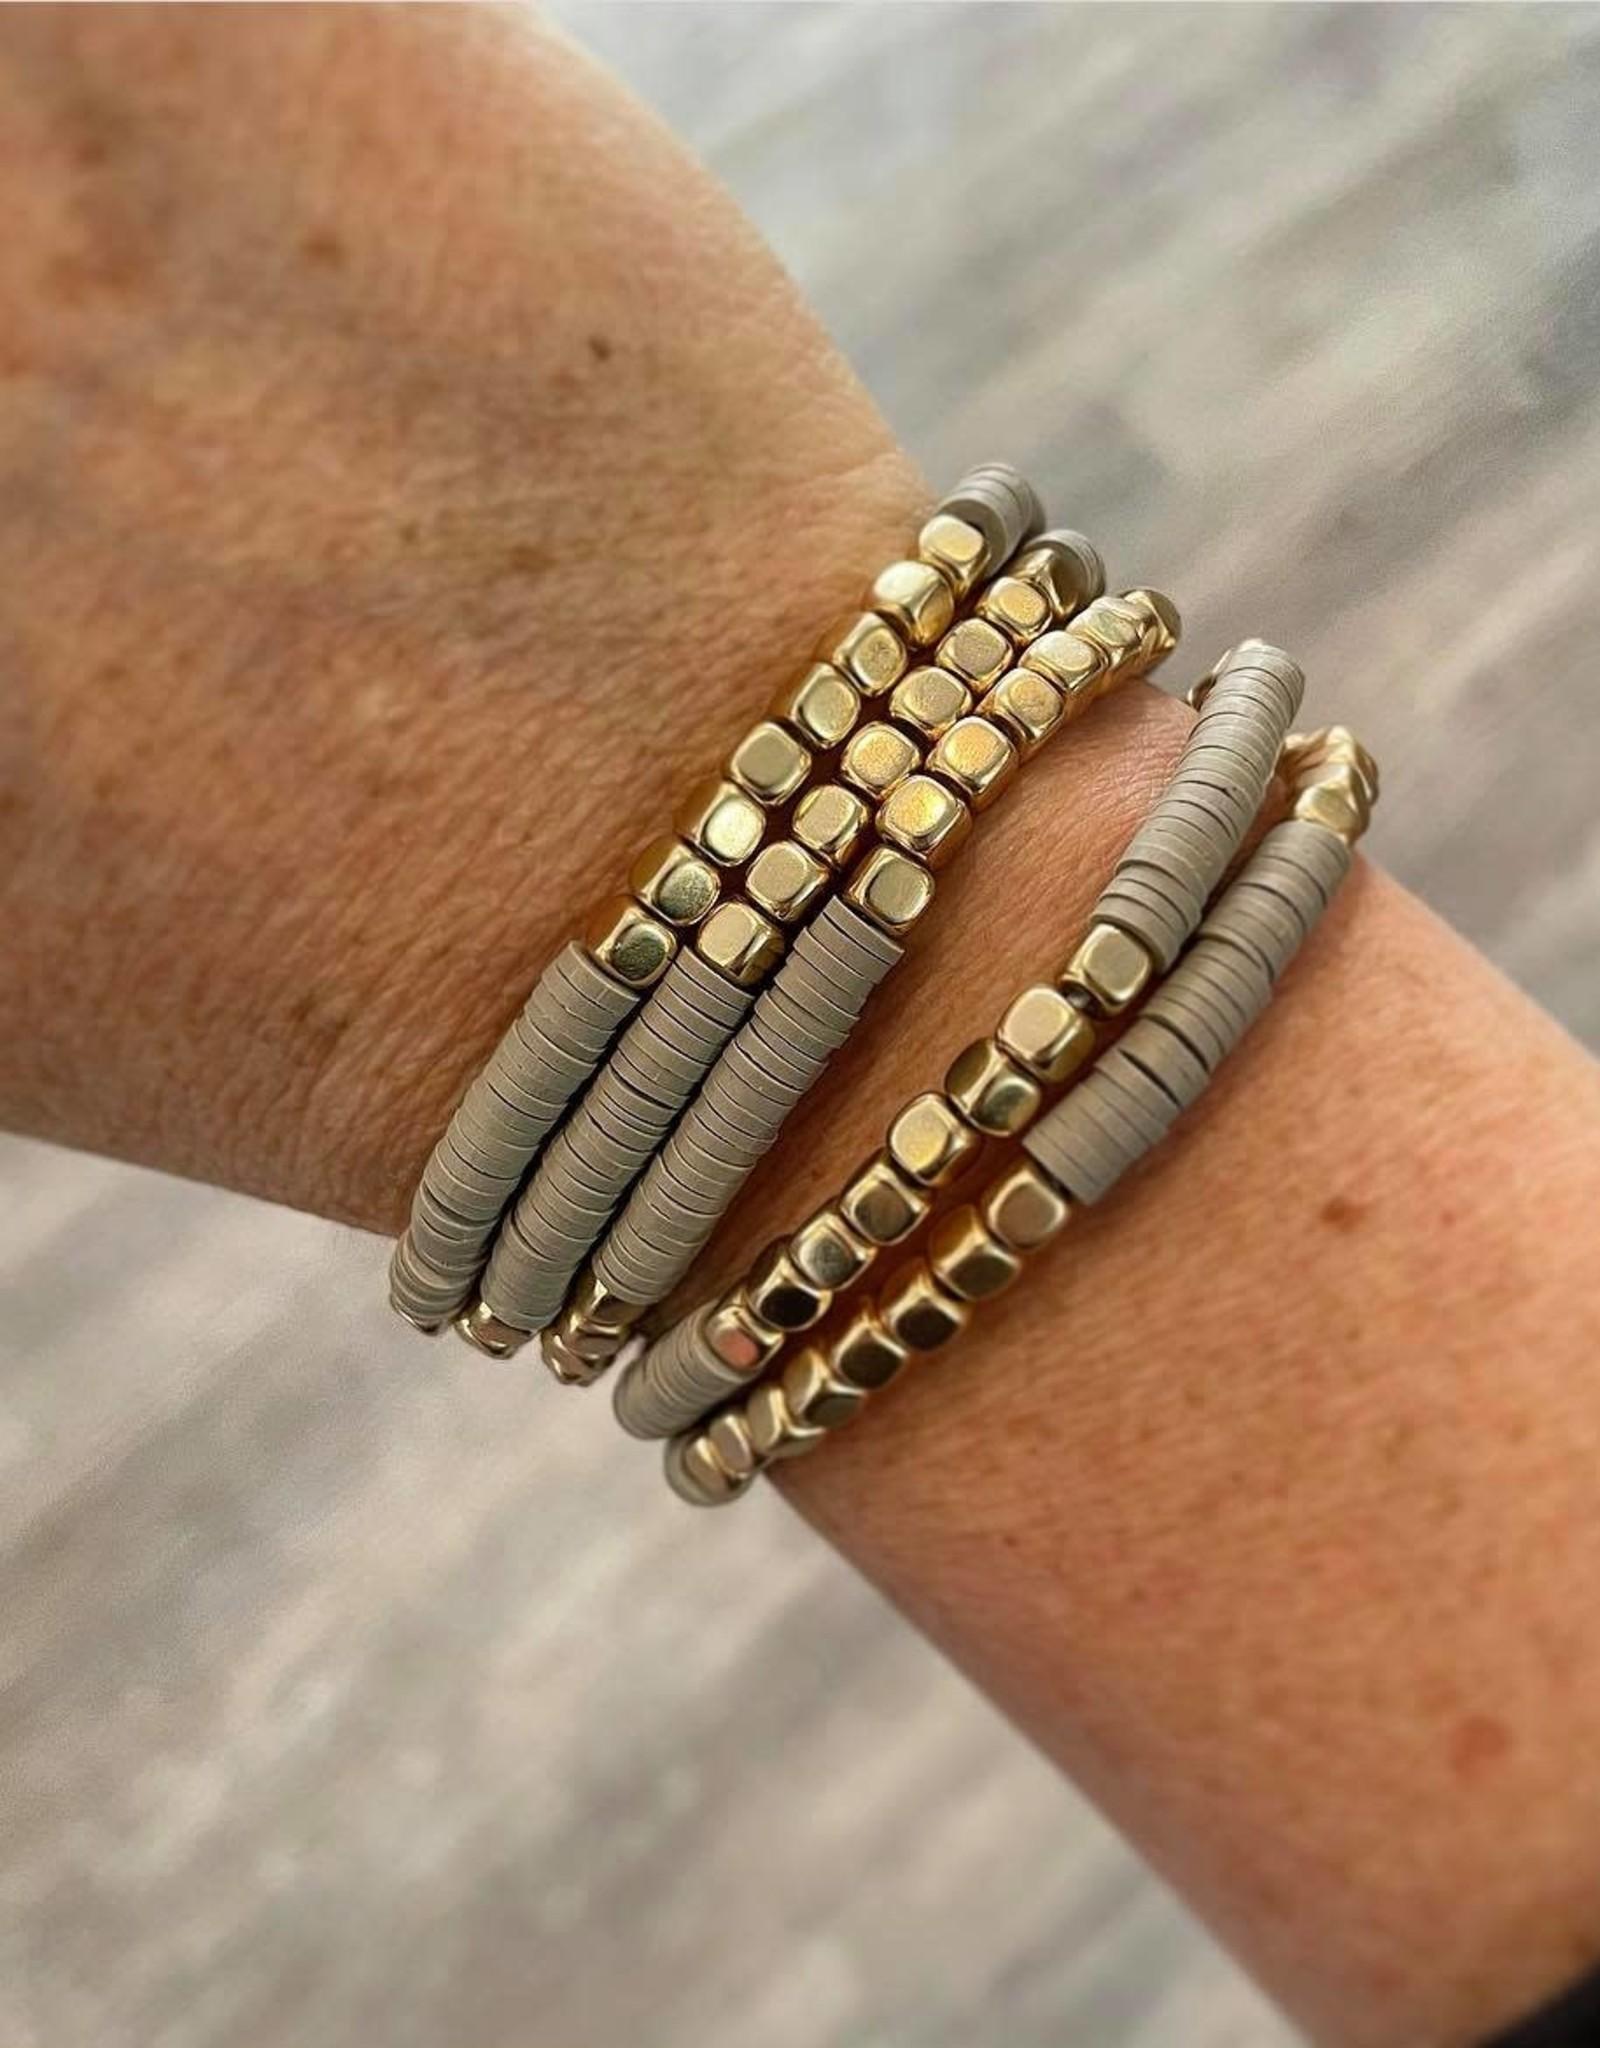 Kate Stretch Bracelet Set in Beige